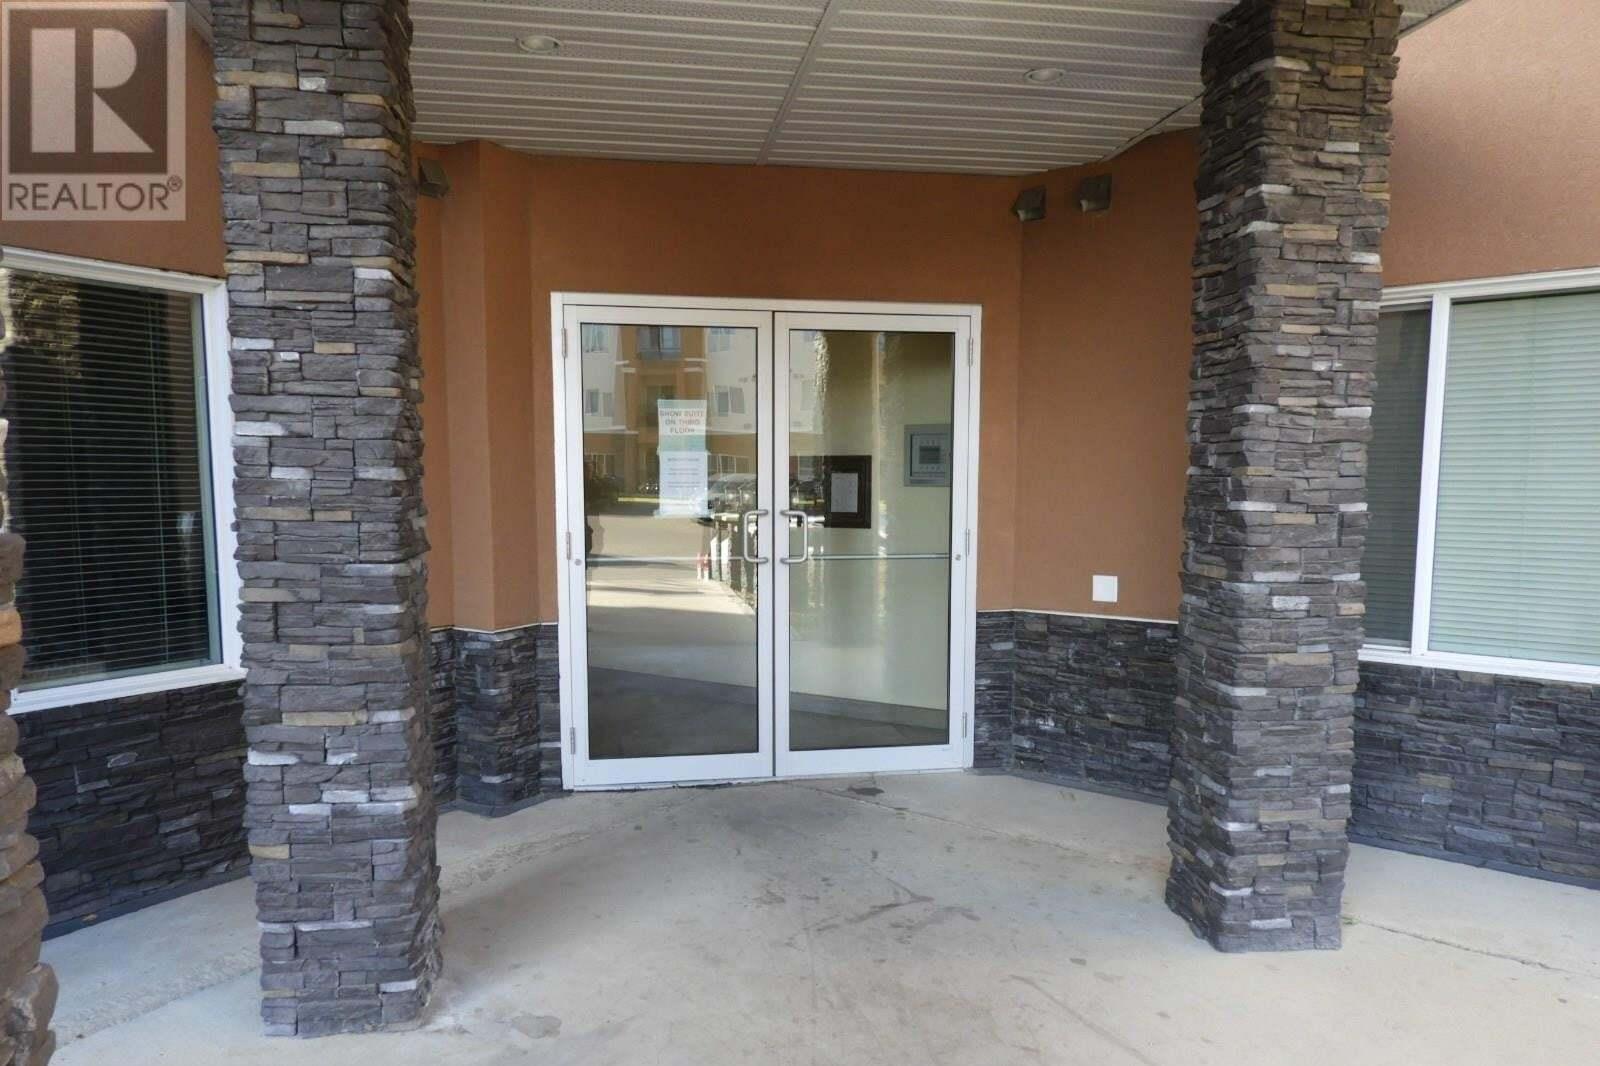 Condo for sale at 142 Pawlychenko Ln Unit 322 Saskatoon Saskatchewan - MLS: SK830754